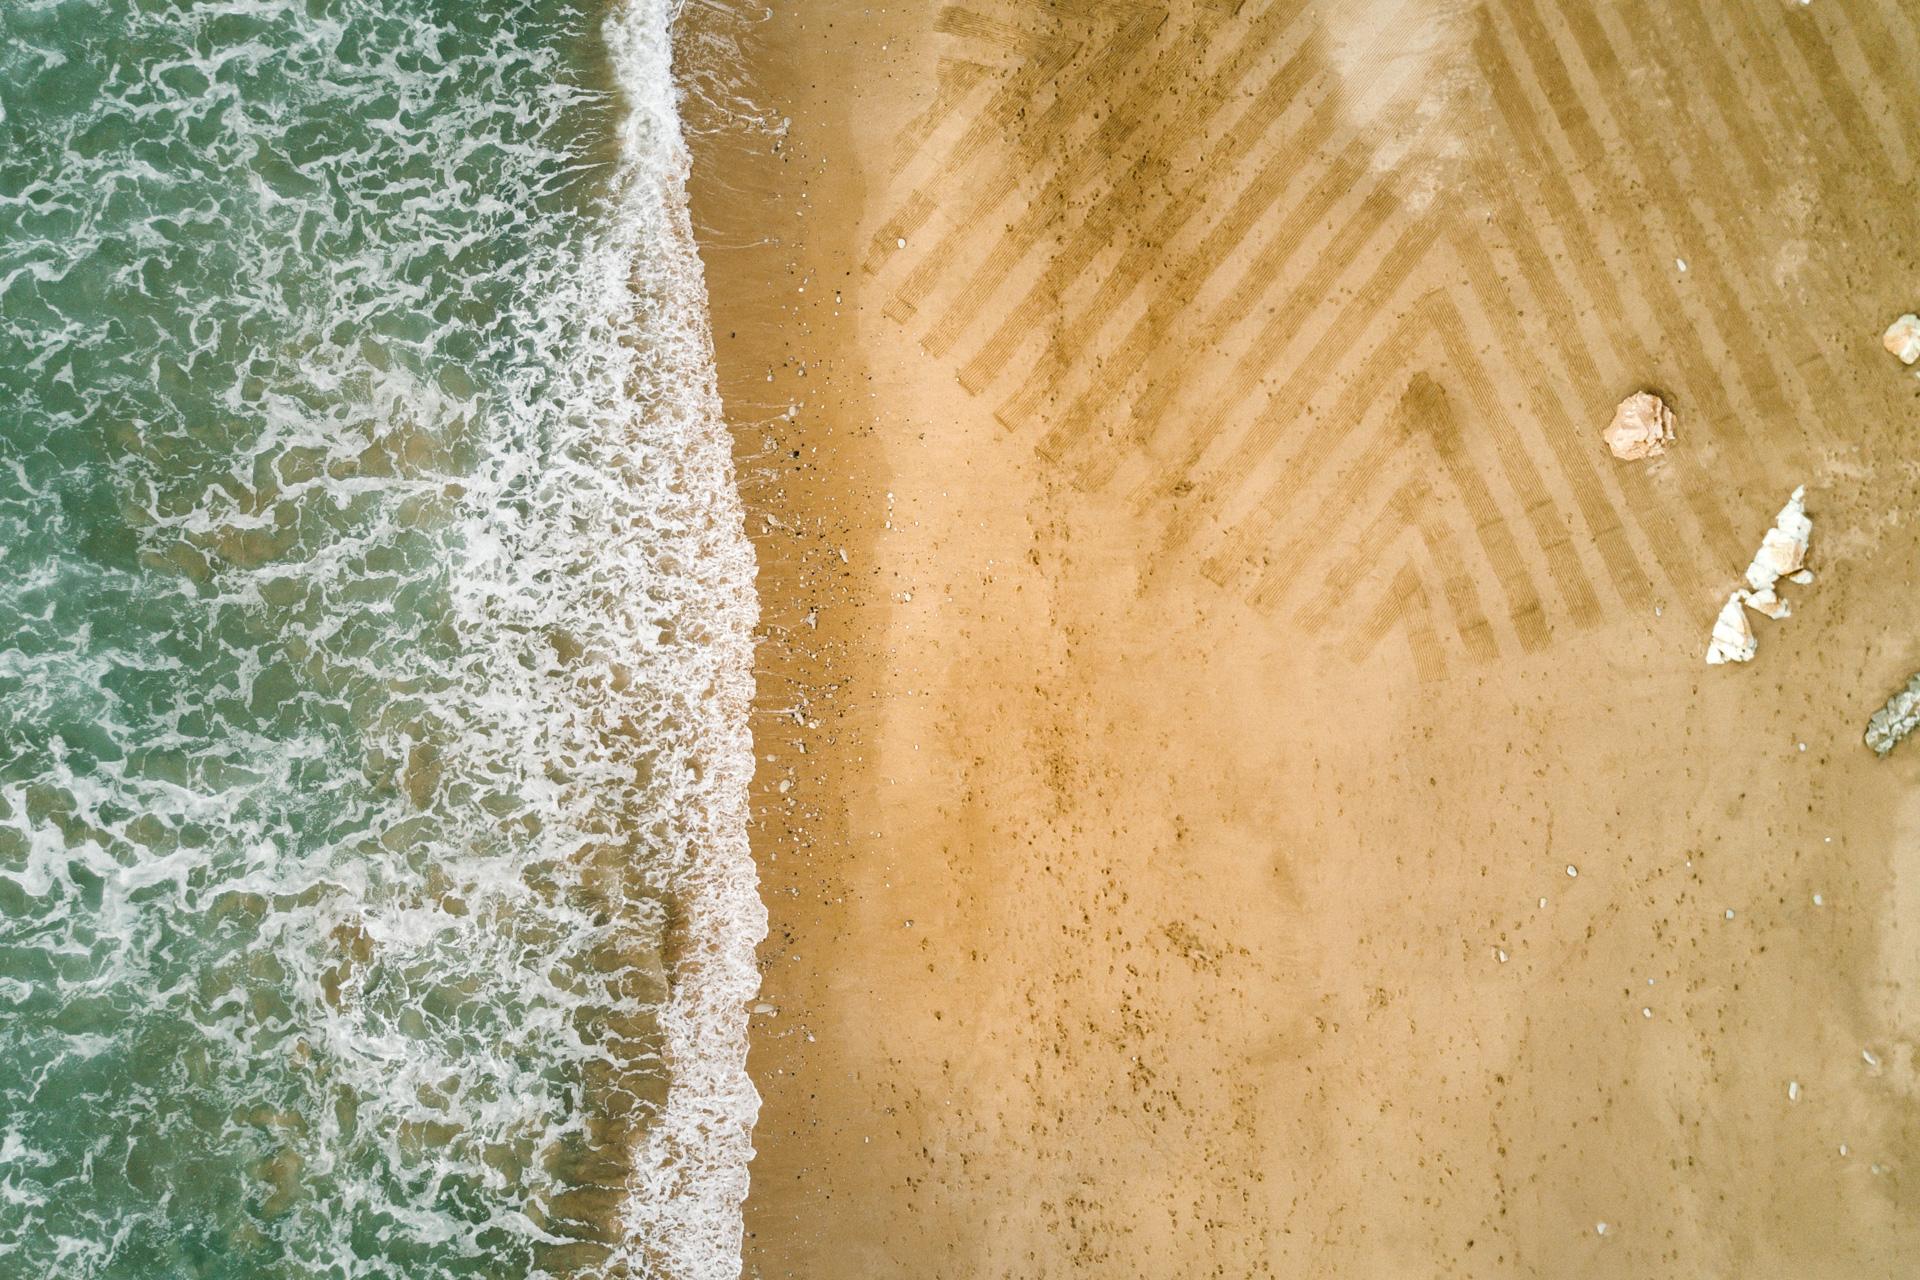 Damien-dohmen-sand-print-lx-one-33